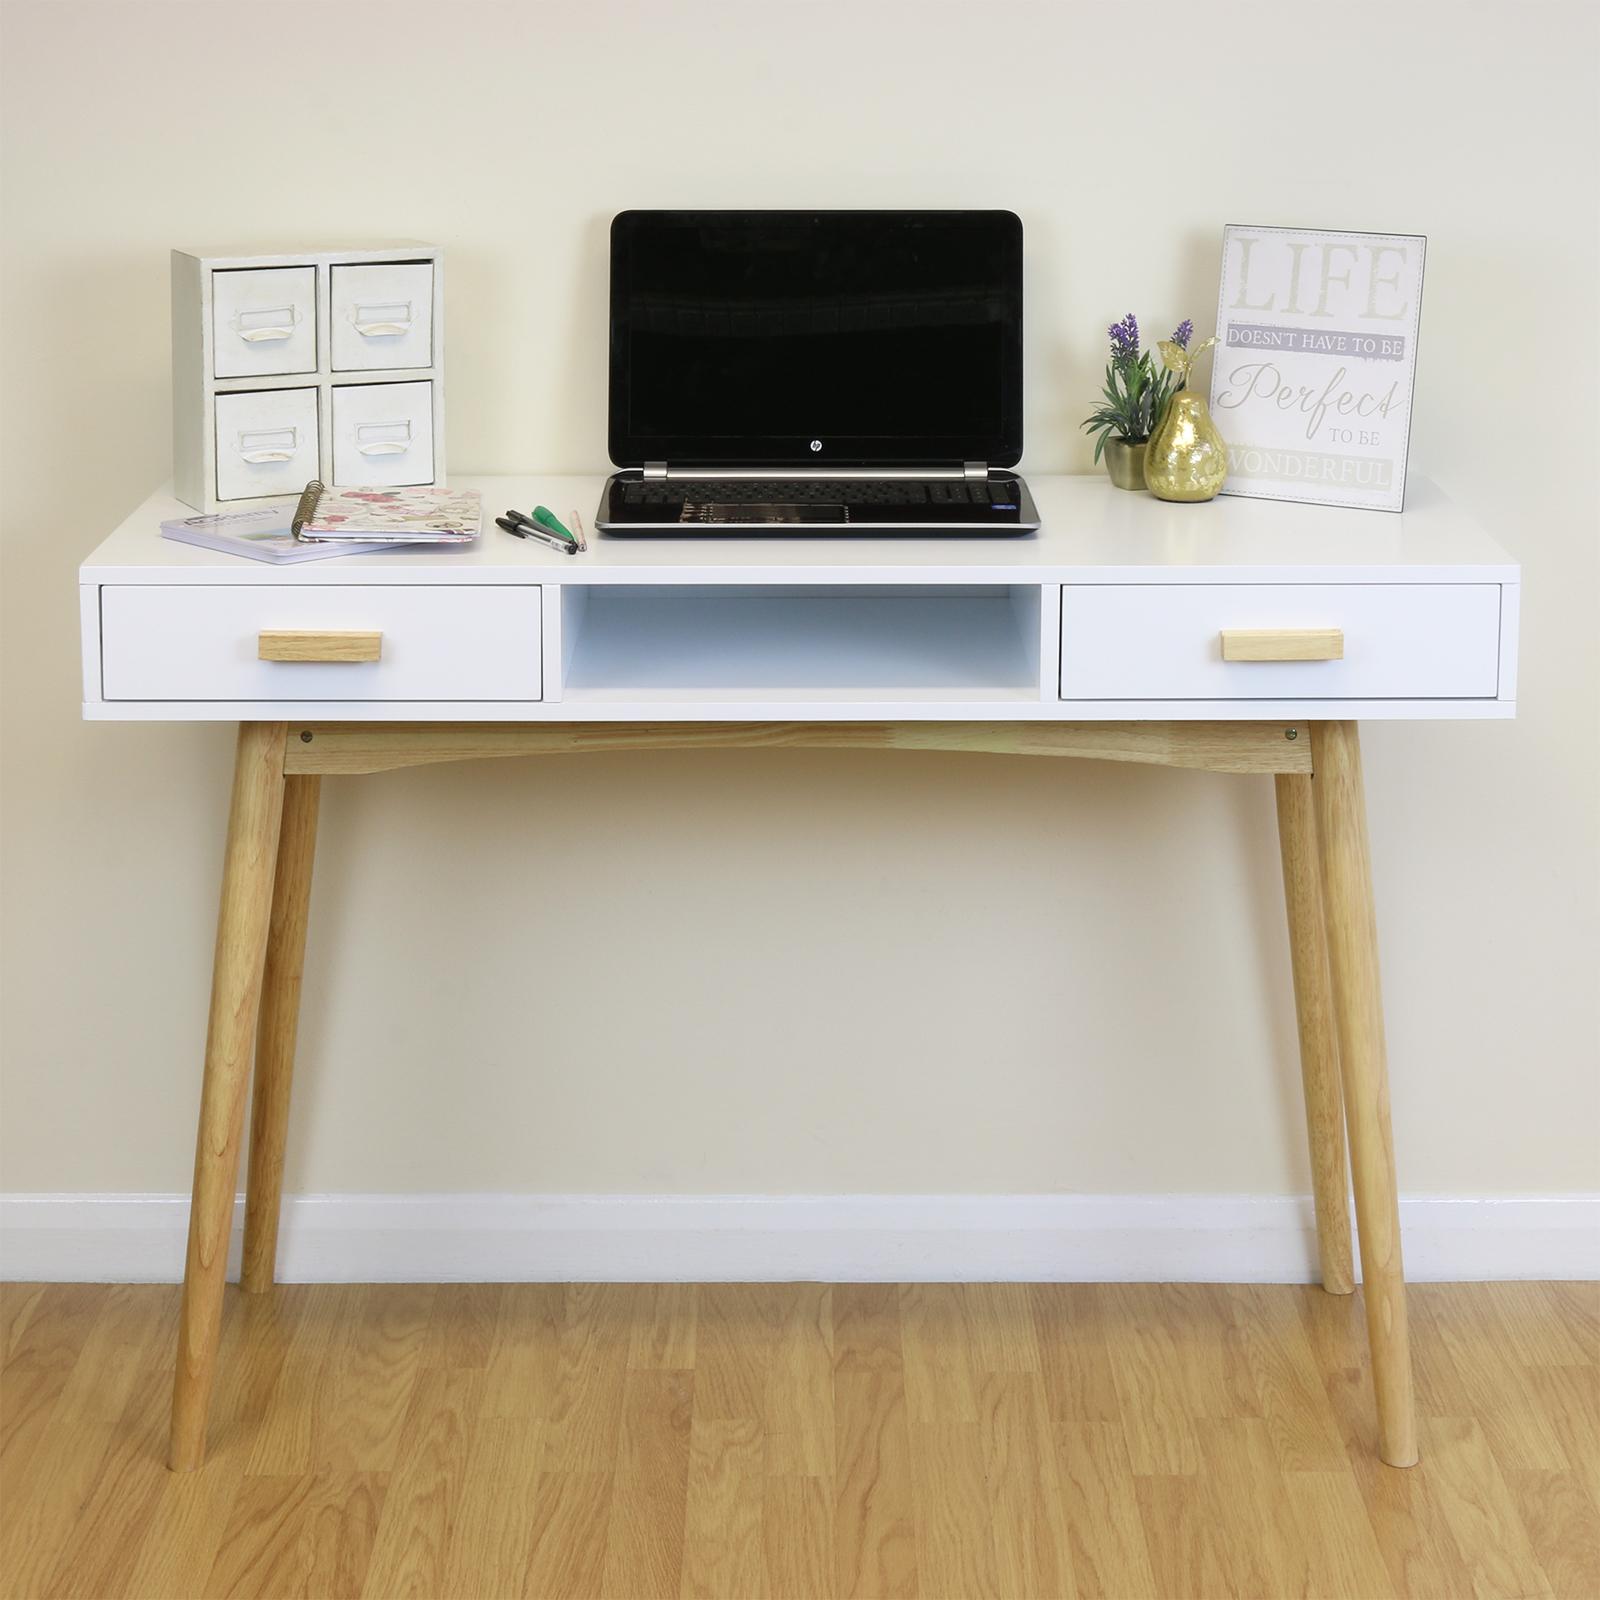 professional makeup chair uk wedding covers huddersfield white scandinavian modern bedroom dressing table